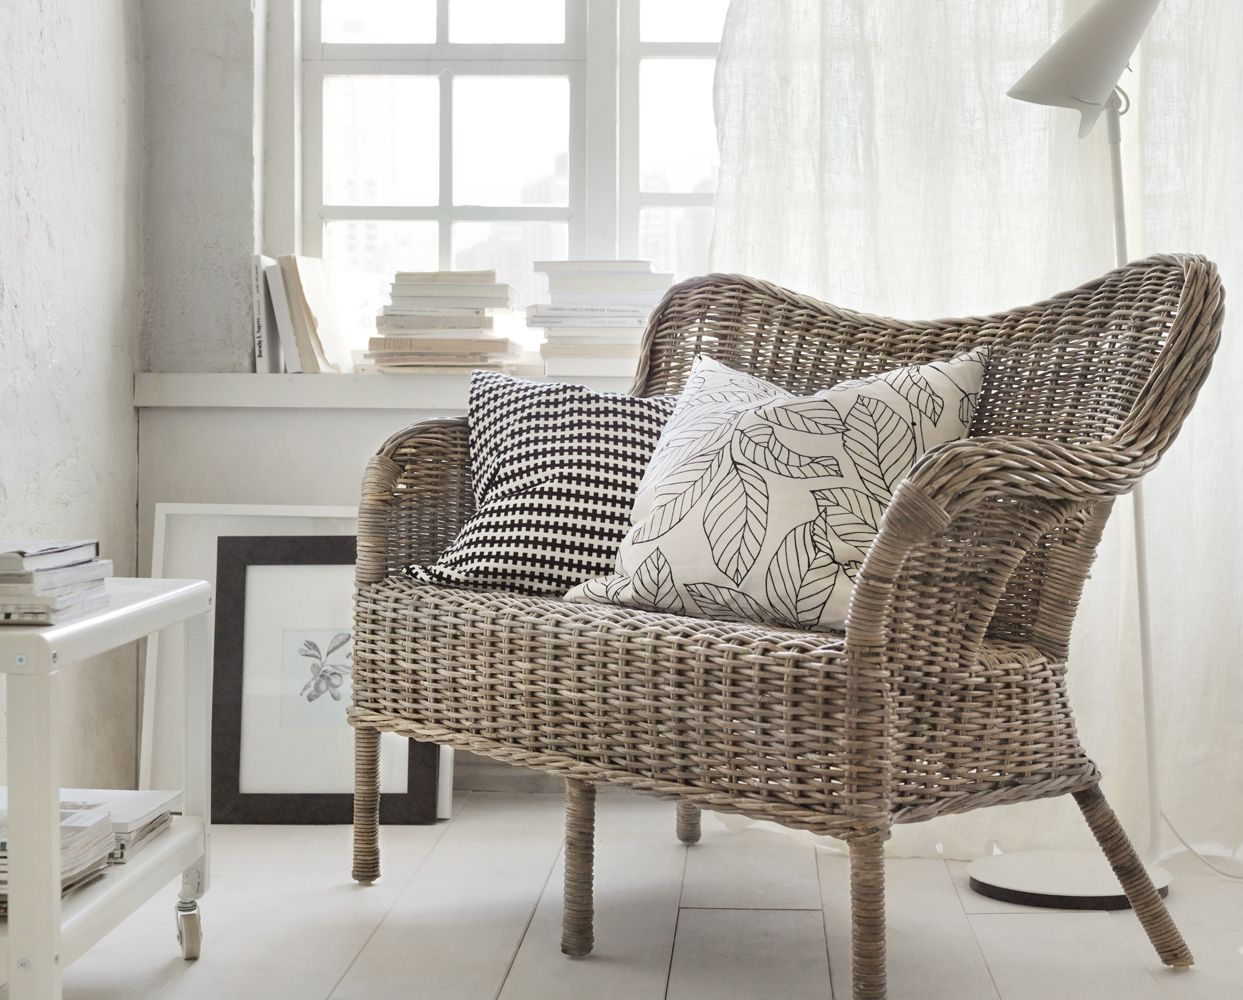 nipprig canap en rotin 99 r f rence. Black Bedroom Furniture Sets. Home Design Ideas